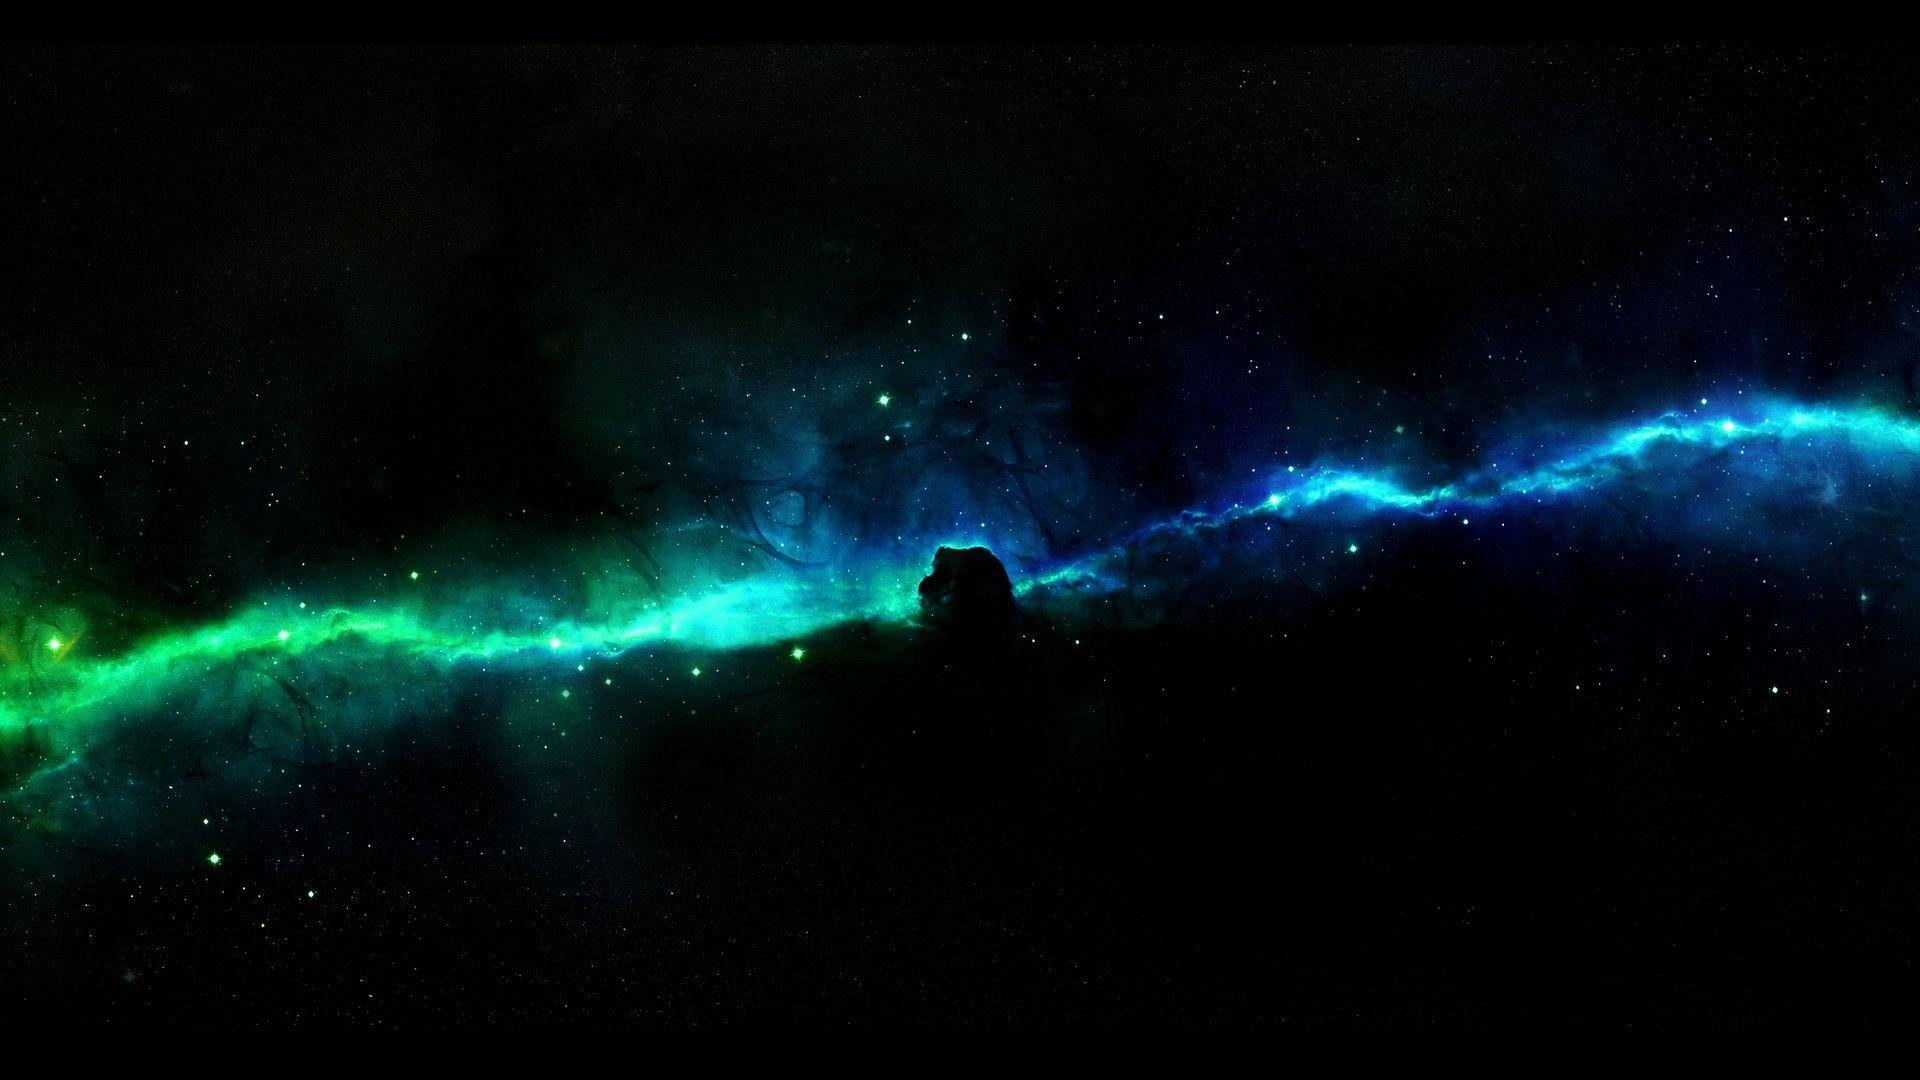 Horsehead Nebula wallpaper 16823 1920x1080